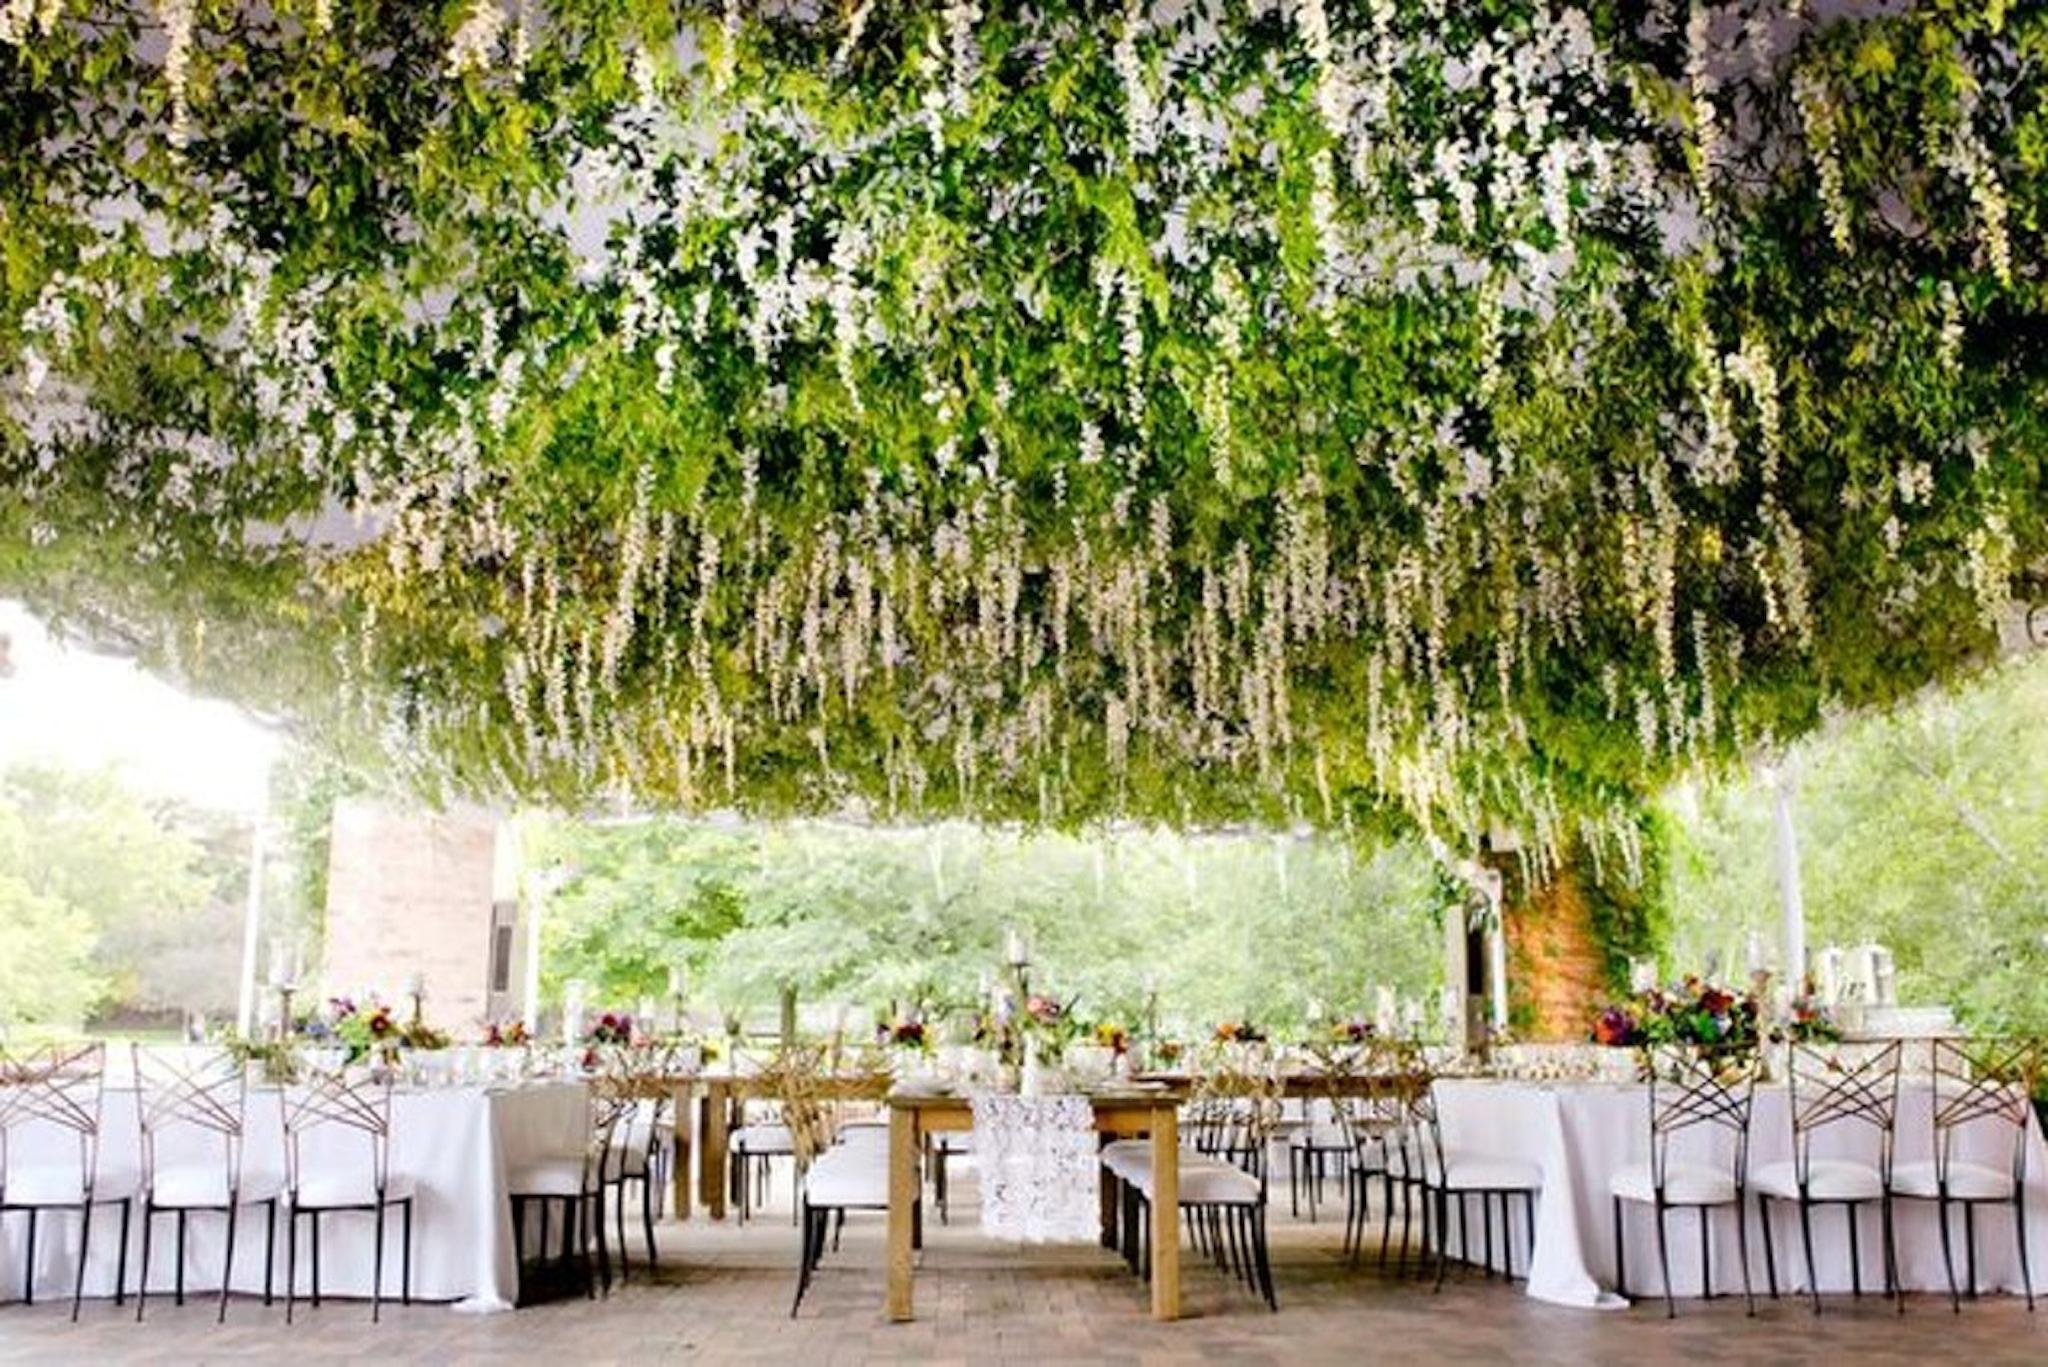 Chicago Botanic Gardens party